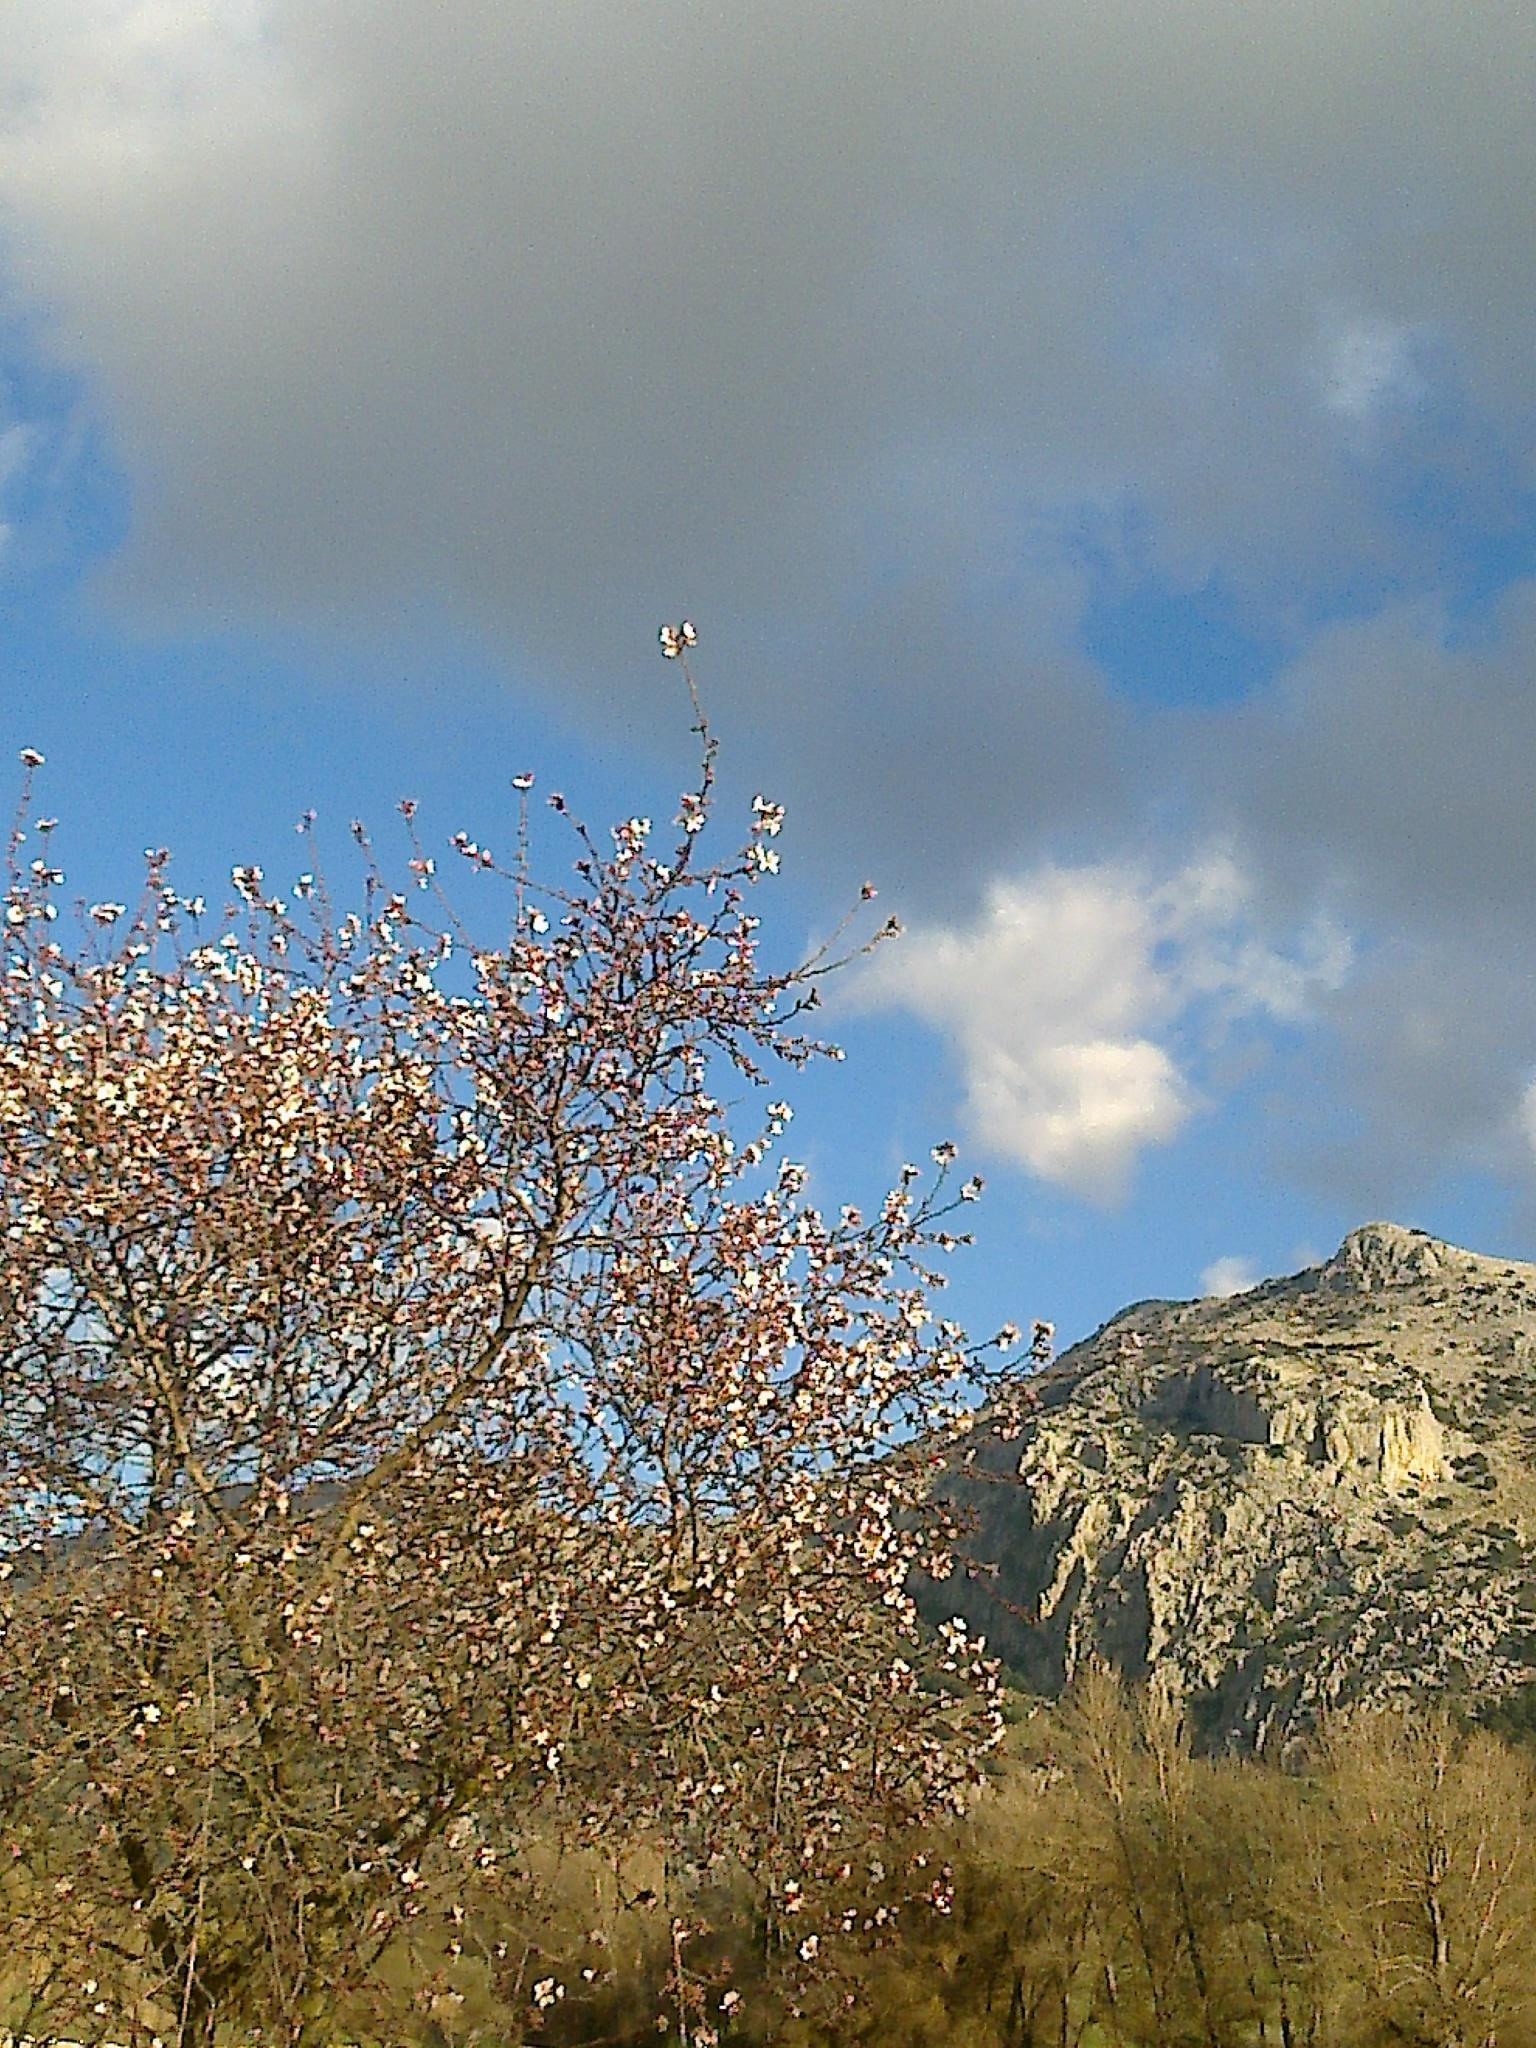 https://www.molinojabonero.com/wp-content/uploads/2014/02/molino_jabonero_febrero1.jpg